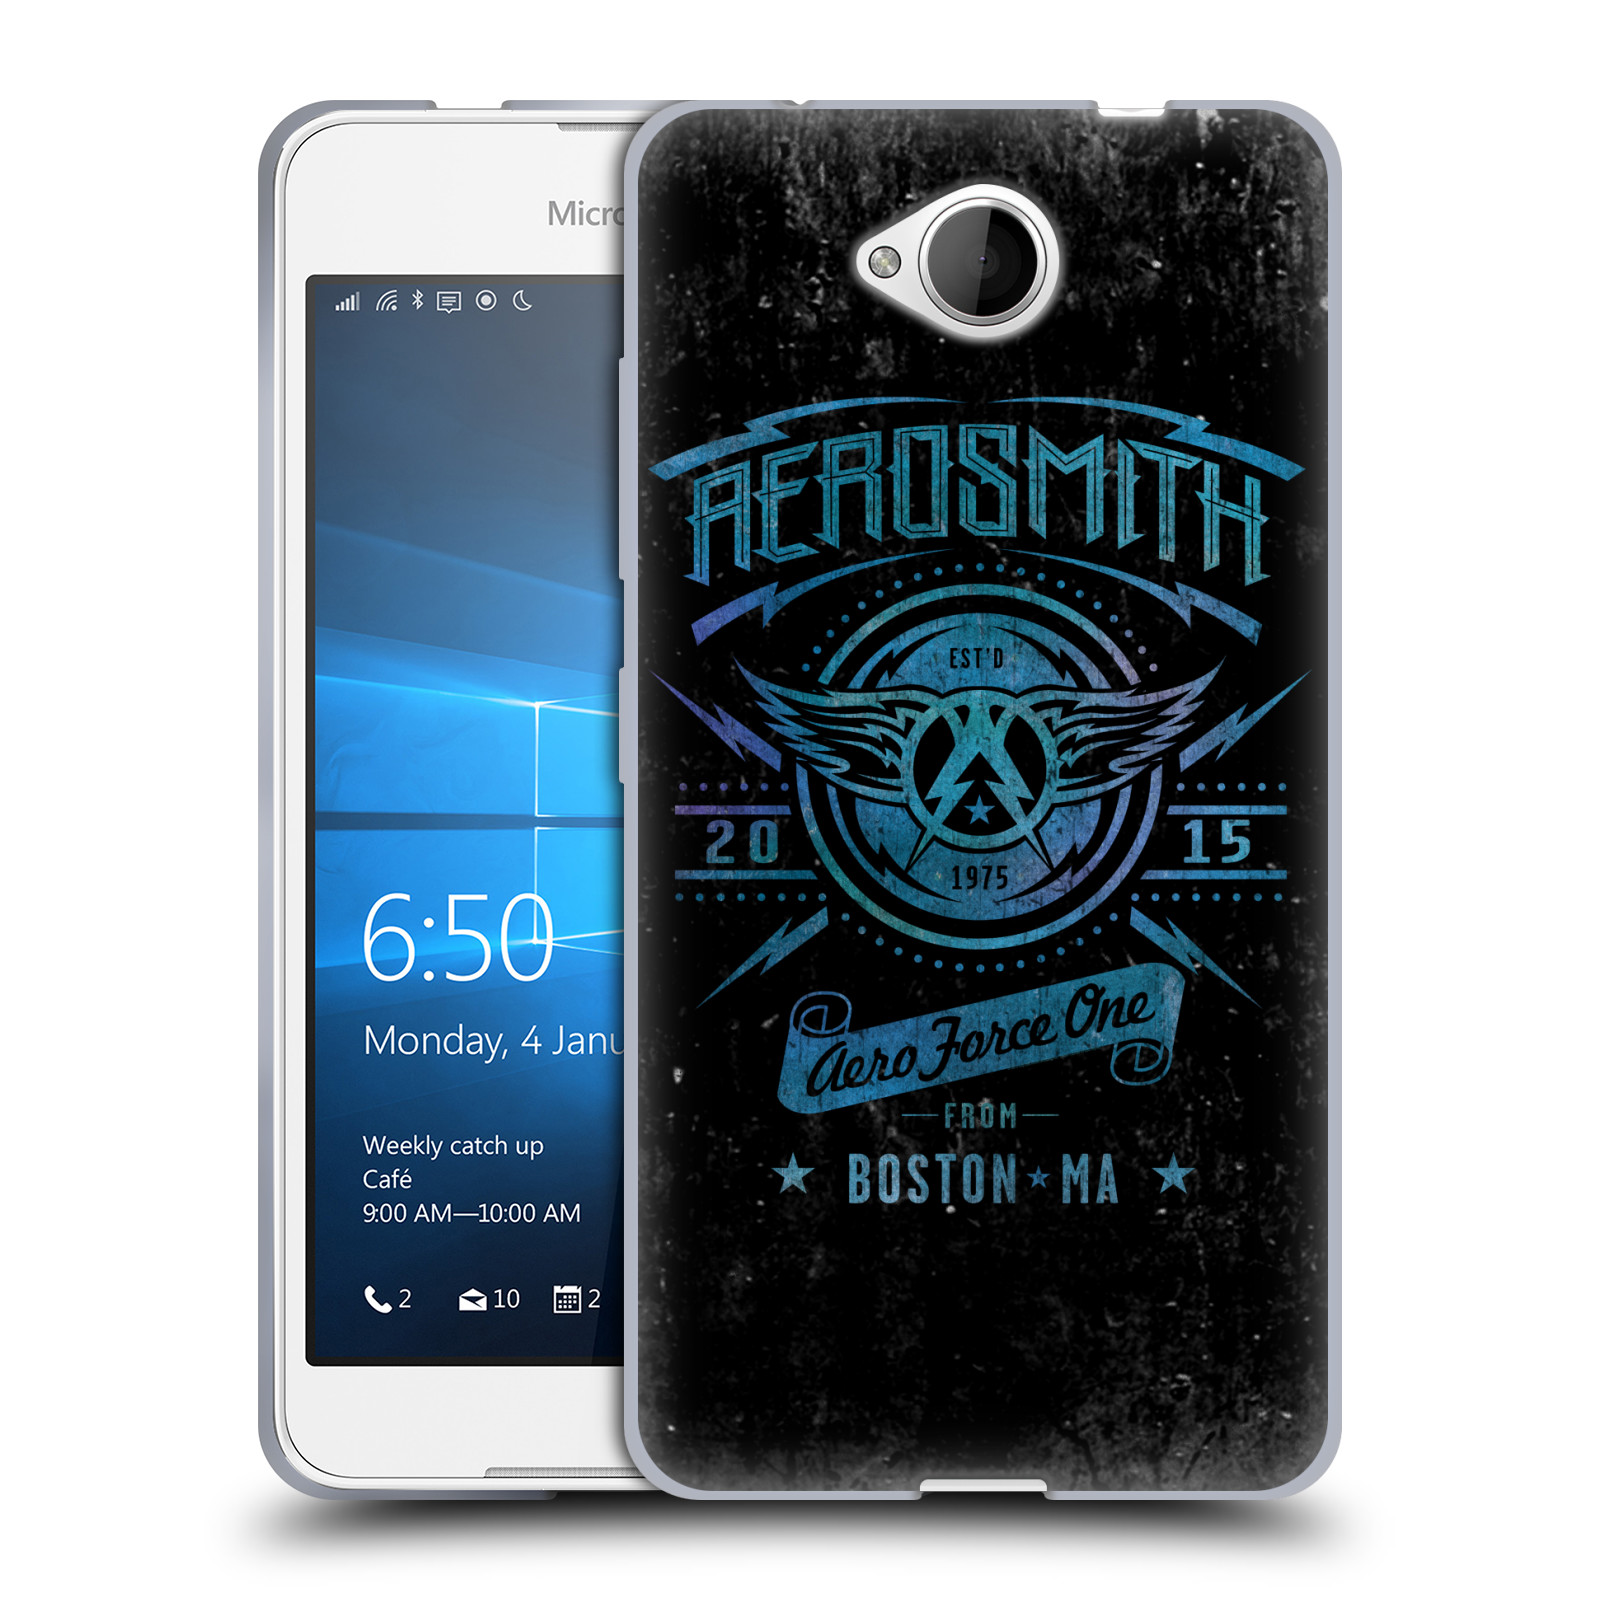 Silikonové pouzdro na mobil Microsoft Lumia 650 HEAD CASE - Aerosmith - Aero Force One